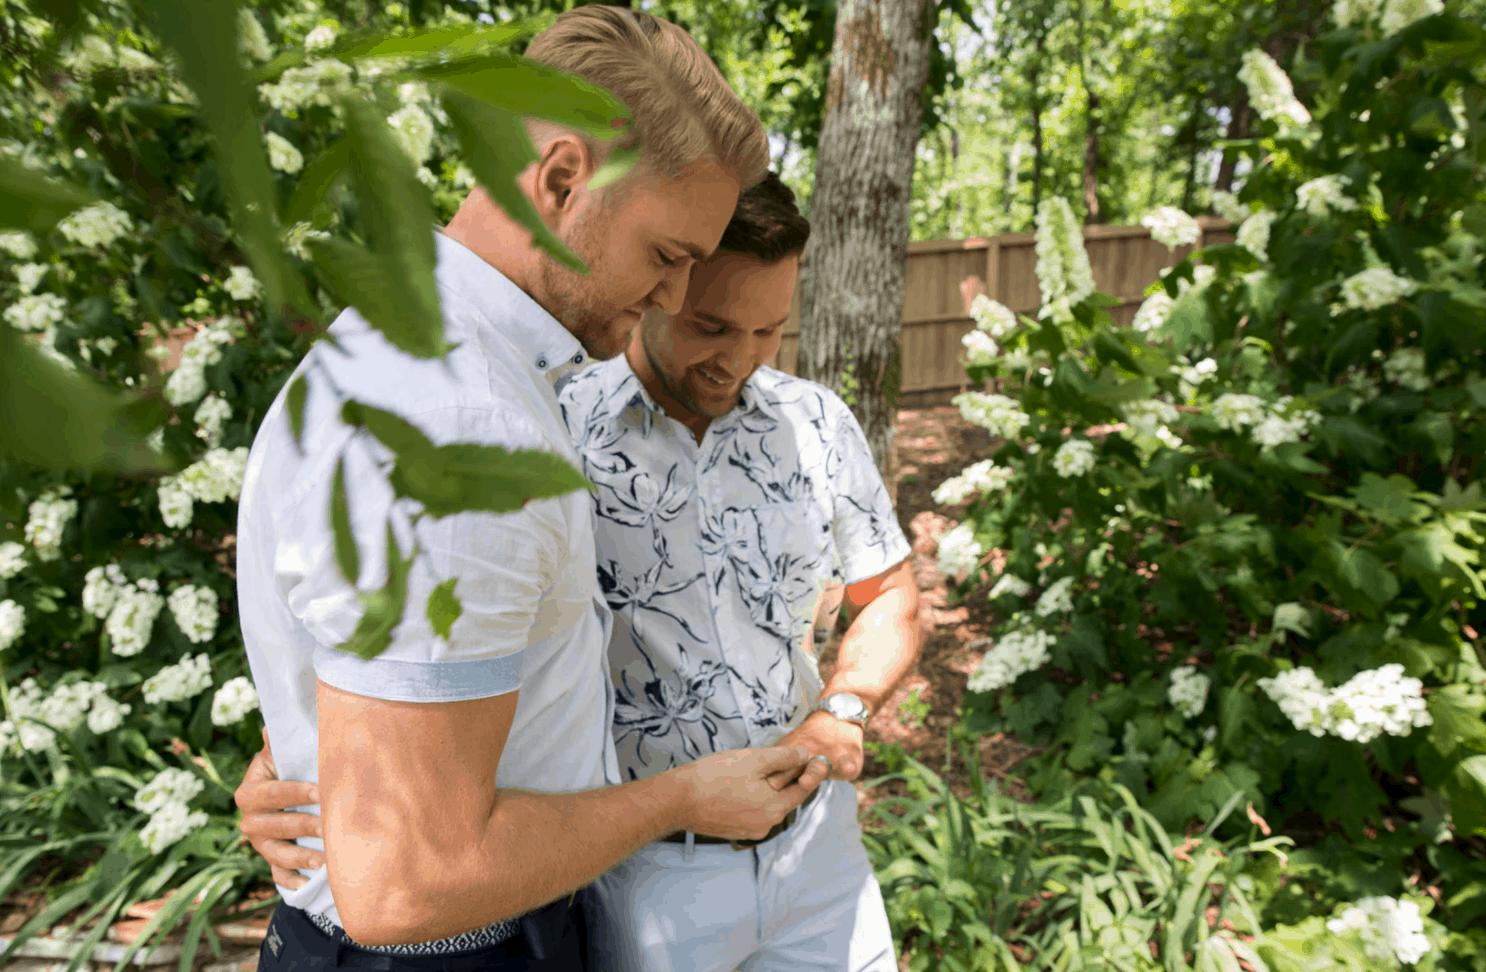 same-sex couples